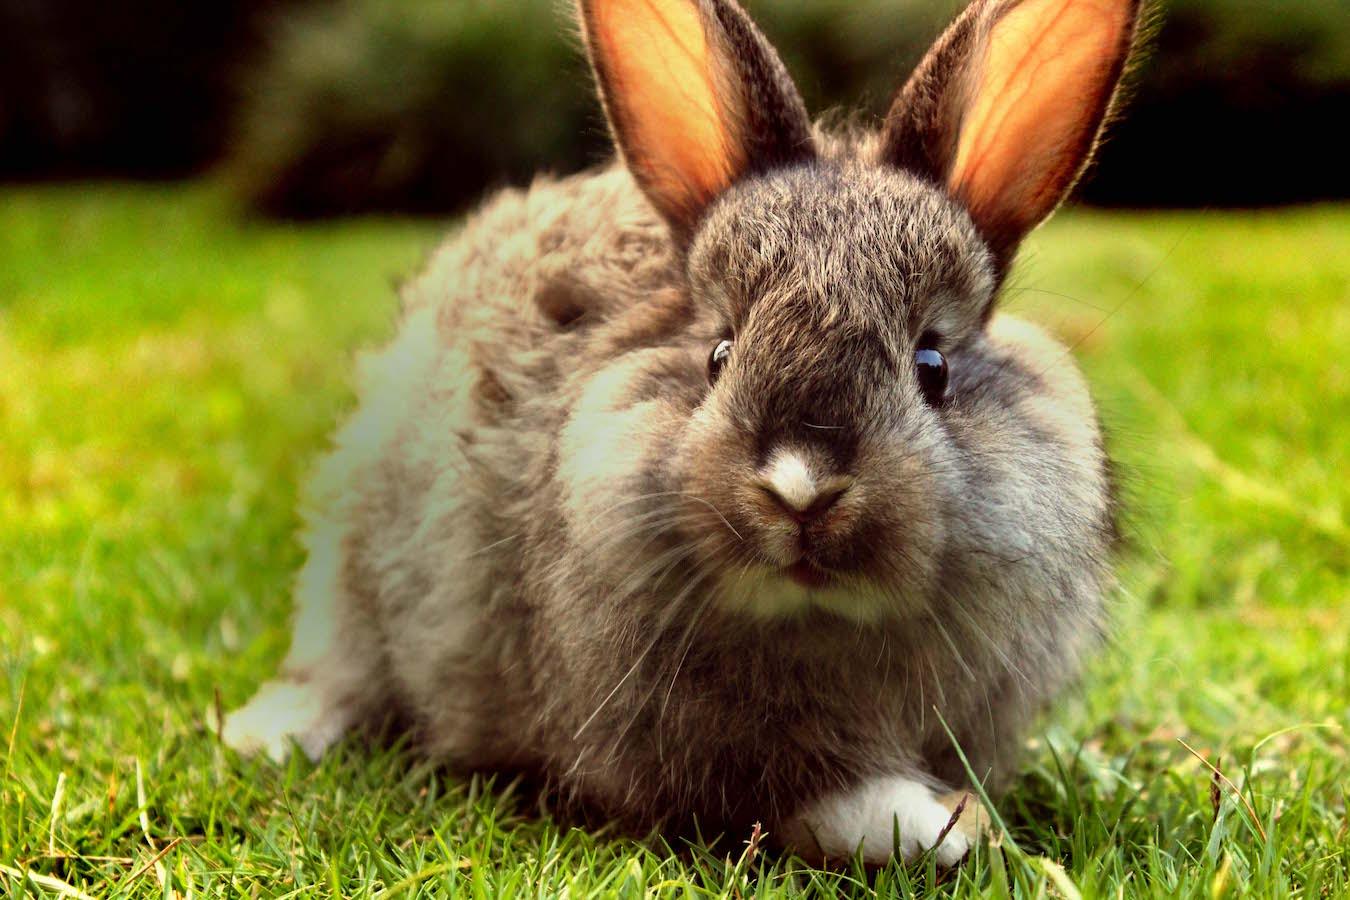 stockvault-a-curious-baby-rabbit-in-a-garden150816